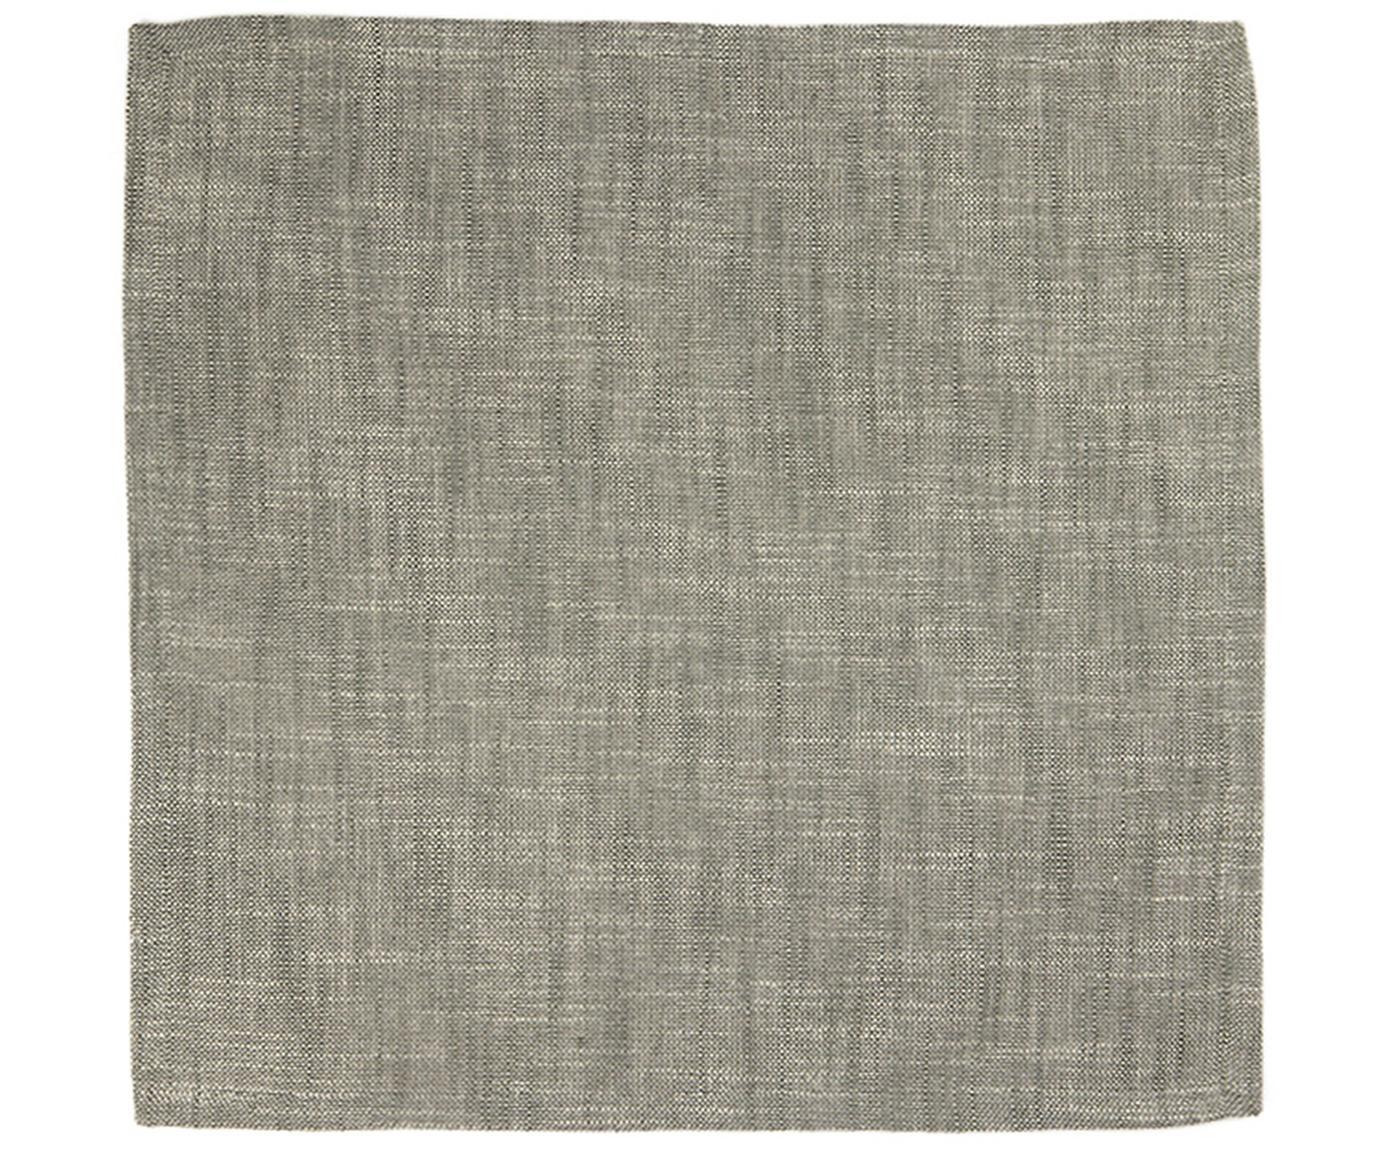 Stoffen servetten Tonnika, 4 stuks, Katoen, Grijs, 45 x 45 cm